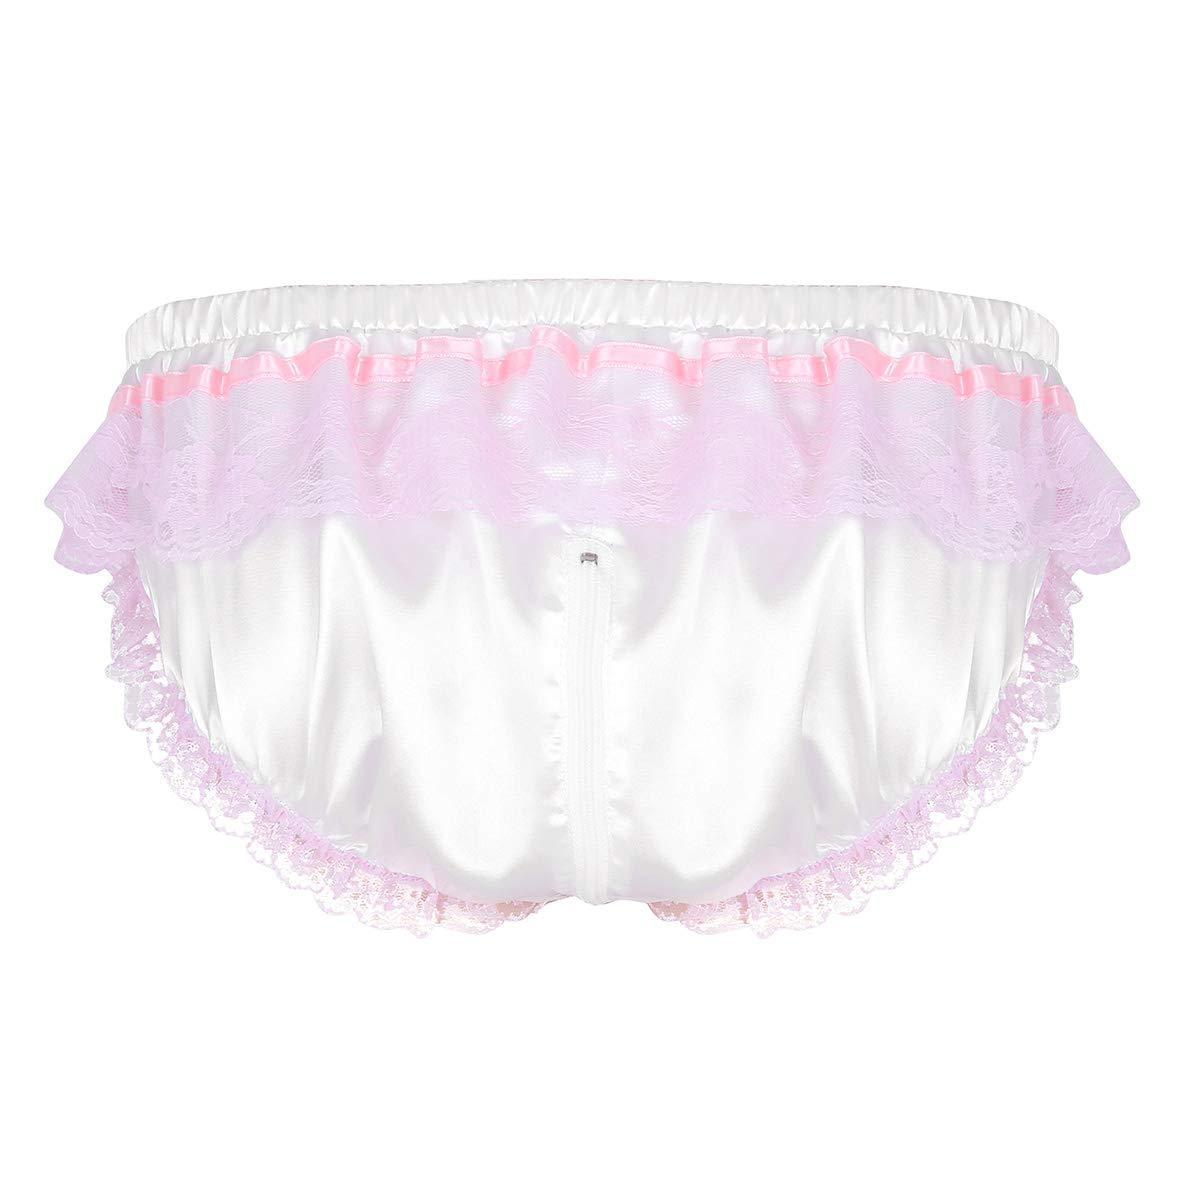 354626064a5cf iiniim Homme Slip String sous-vêtements Culotte Sexy Dentelle Satin ...